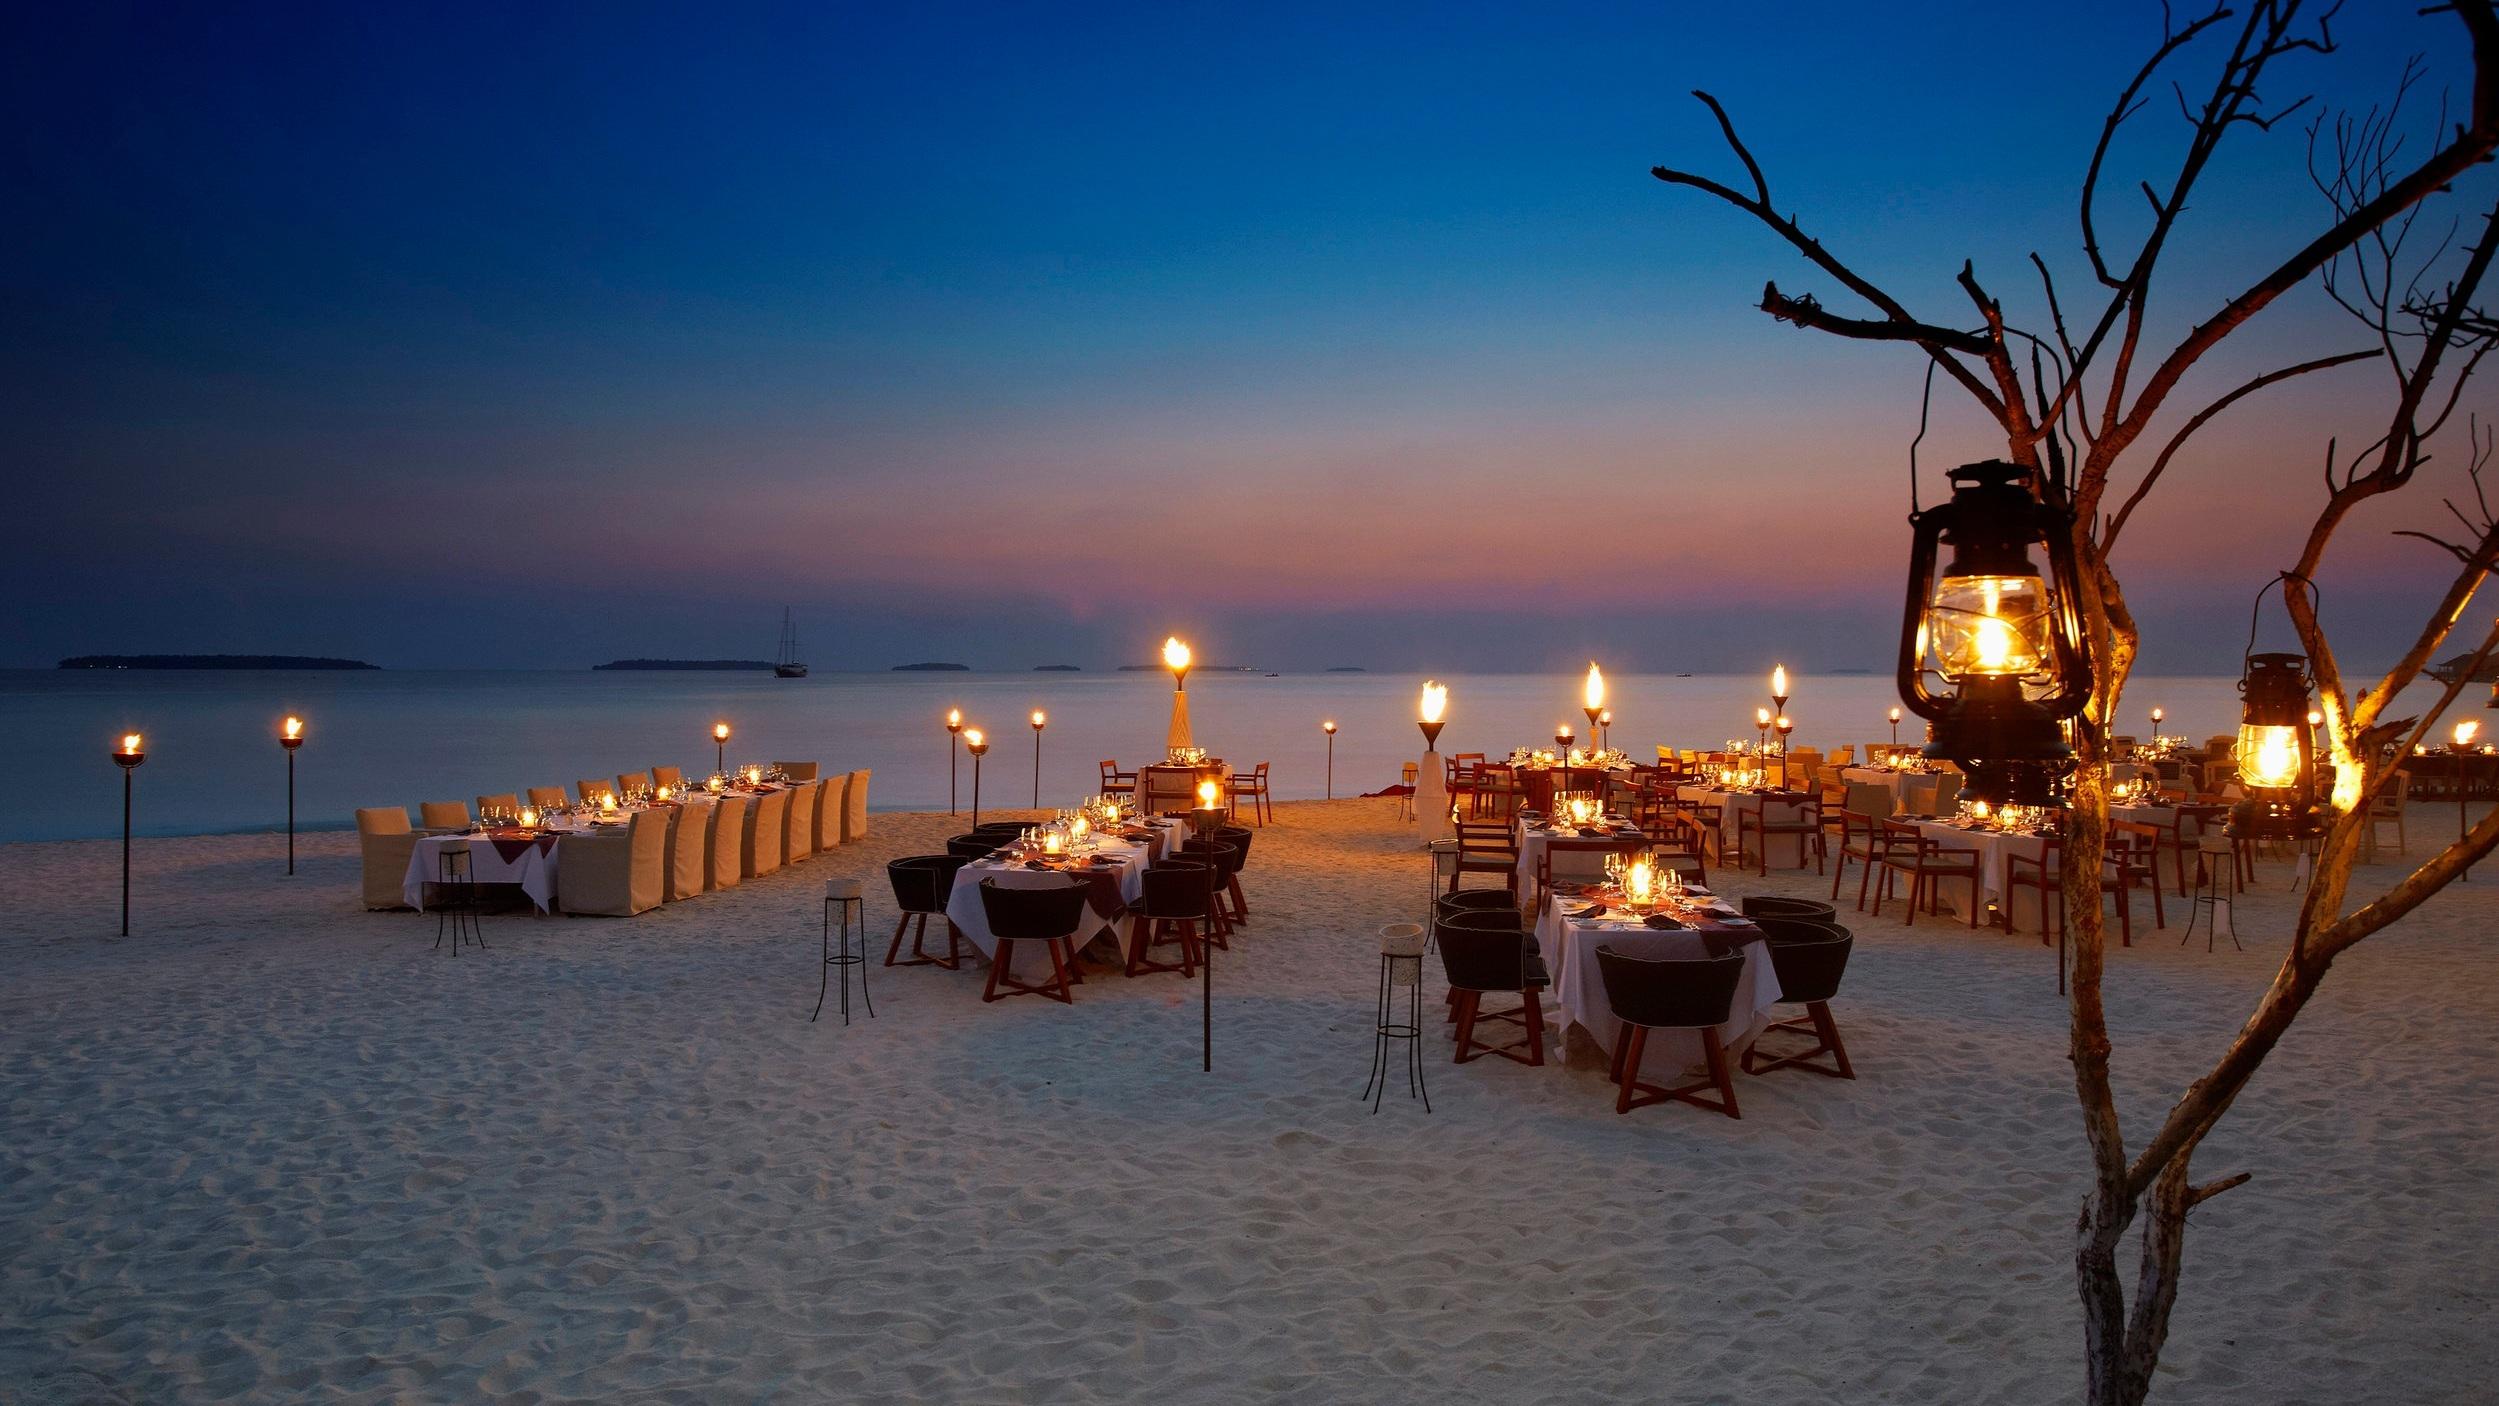 Manzaru Special Occasion Beach Dining